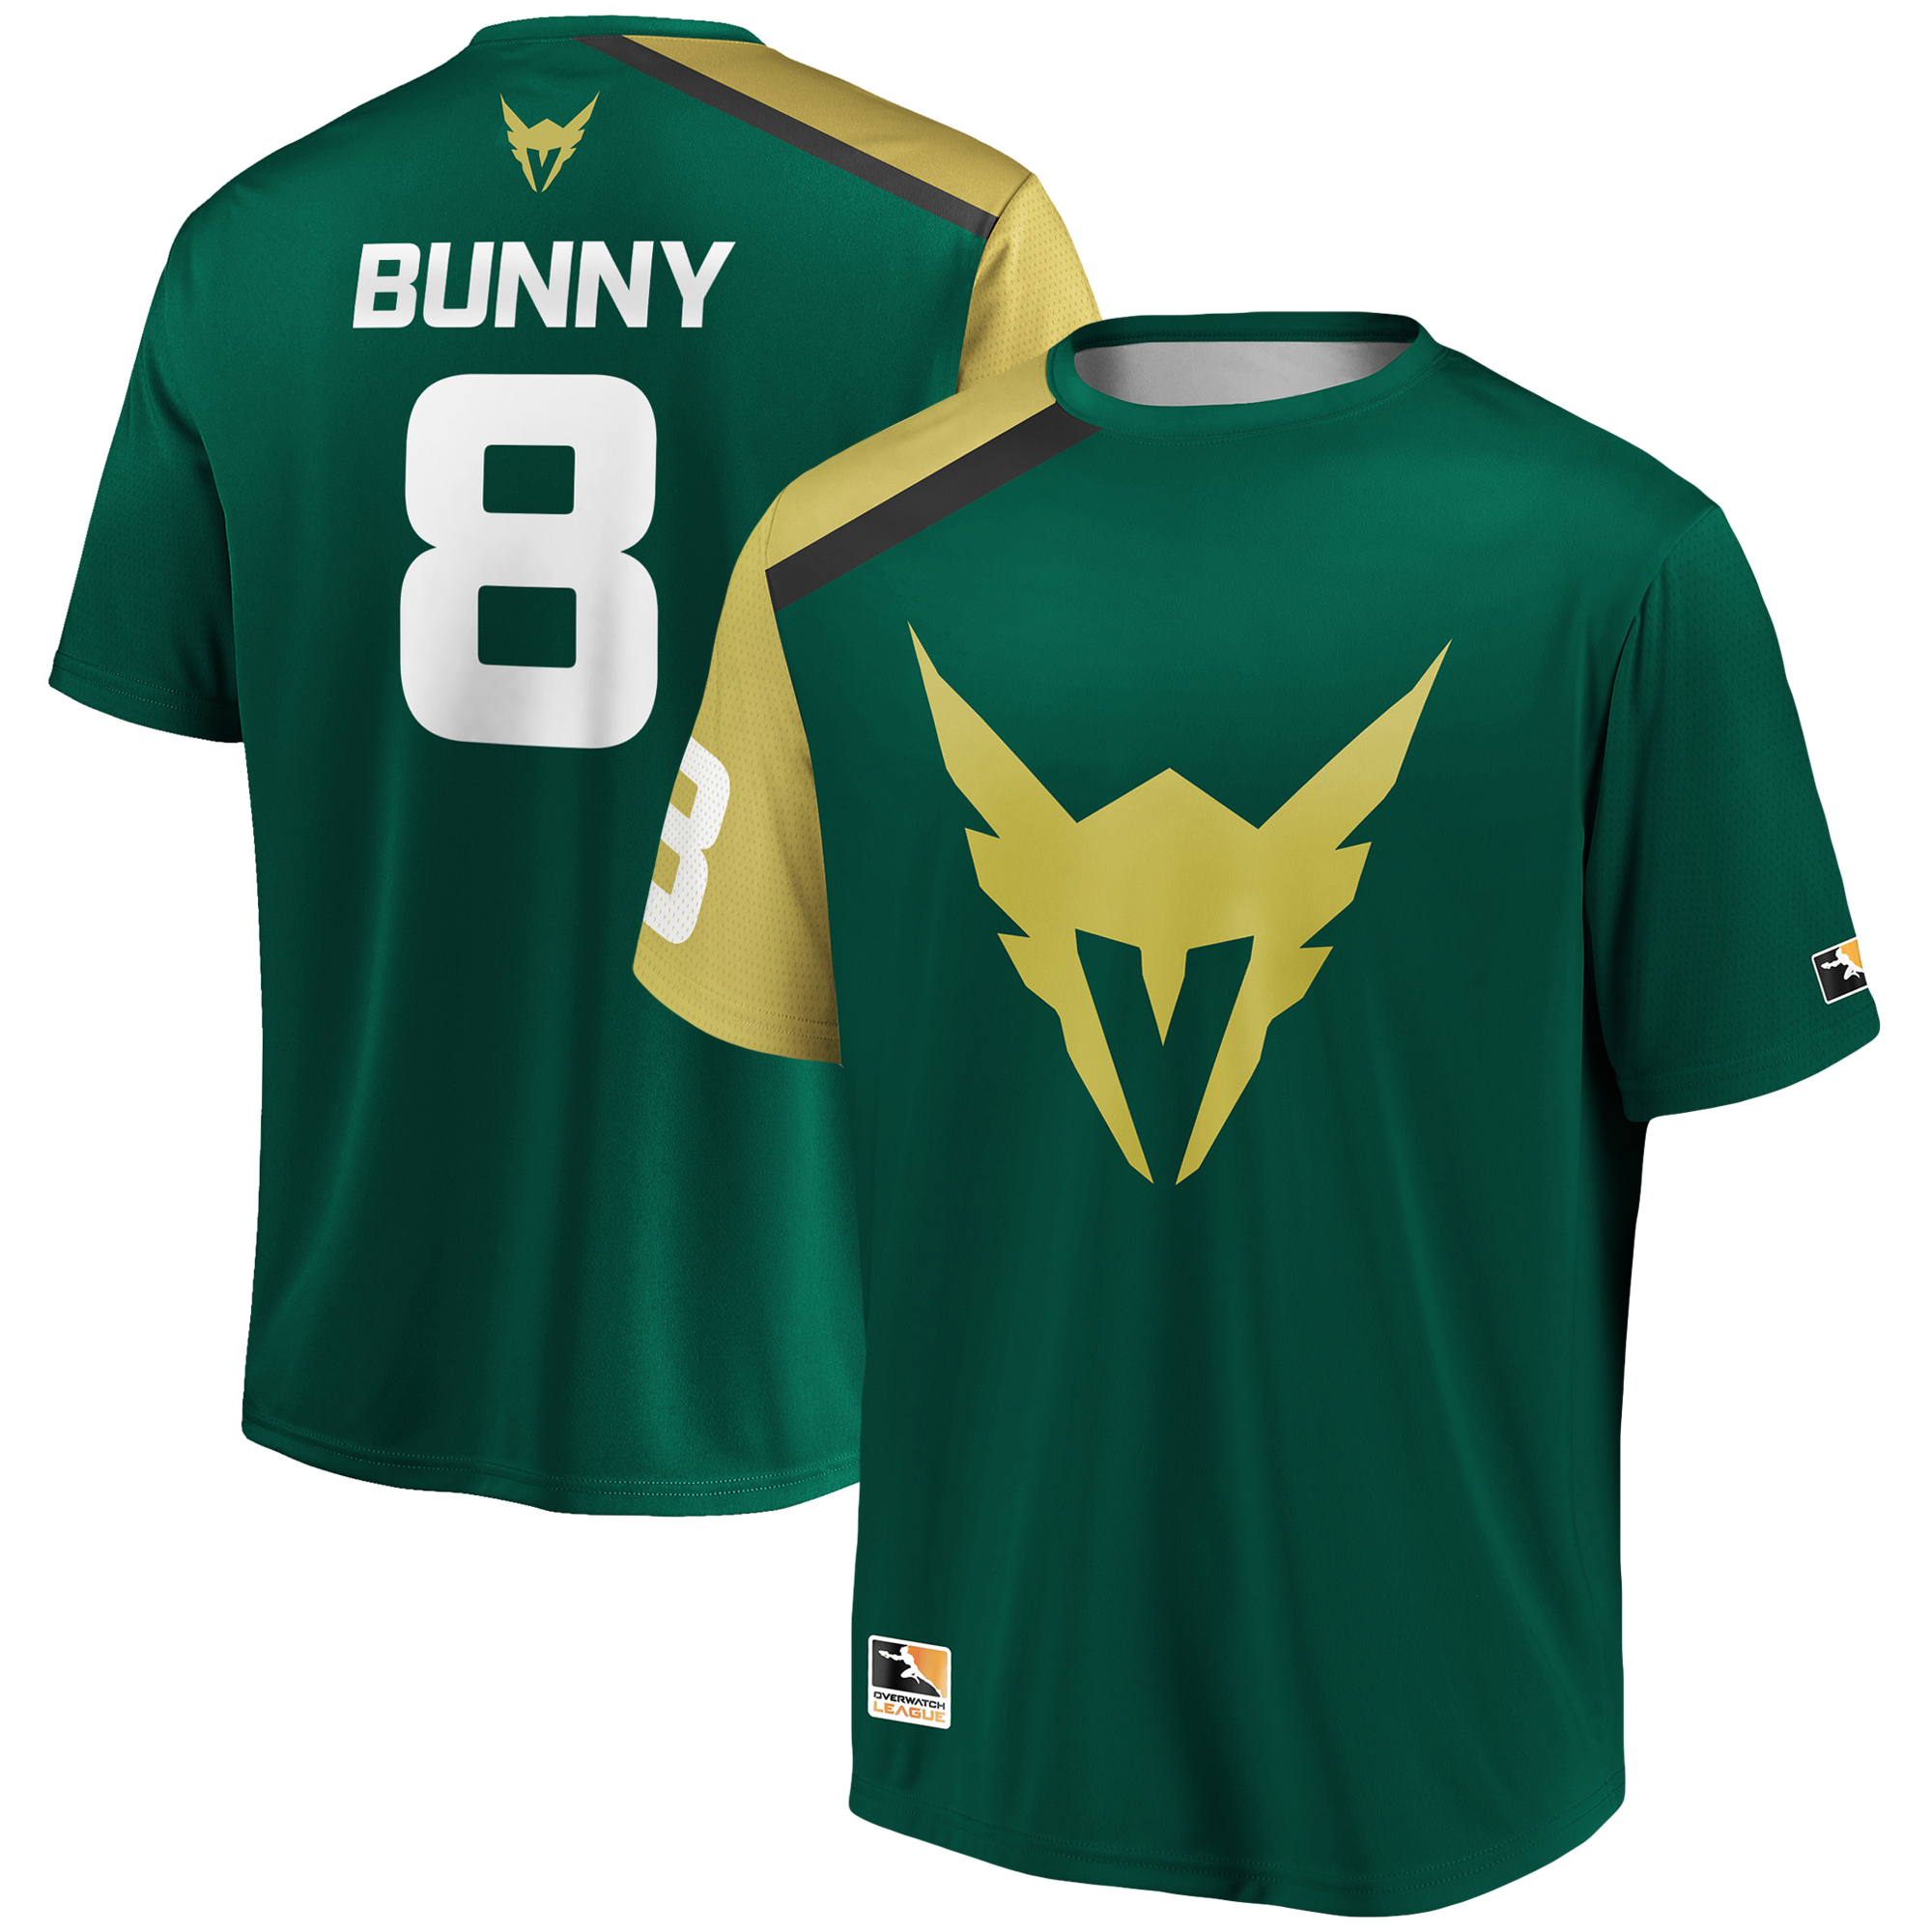 Bunny Los Angeles Valiant Overwatch League Replica Home Jersey - Green